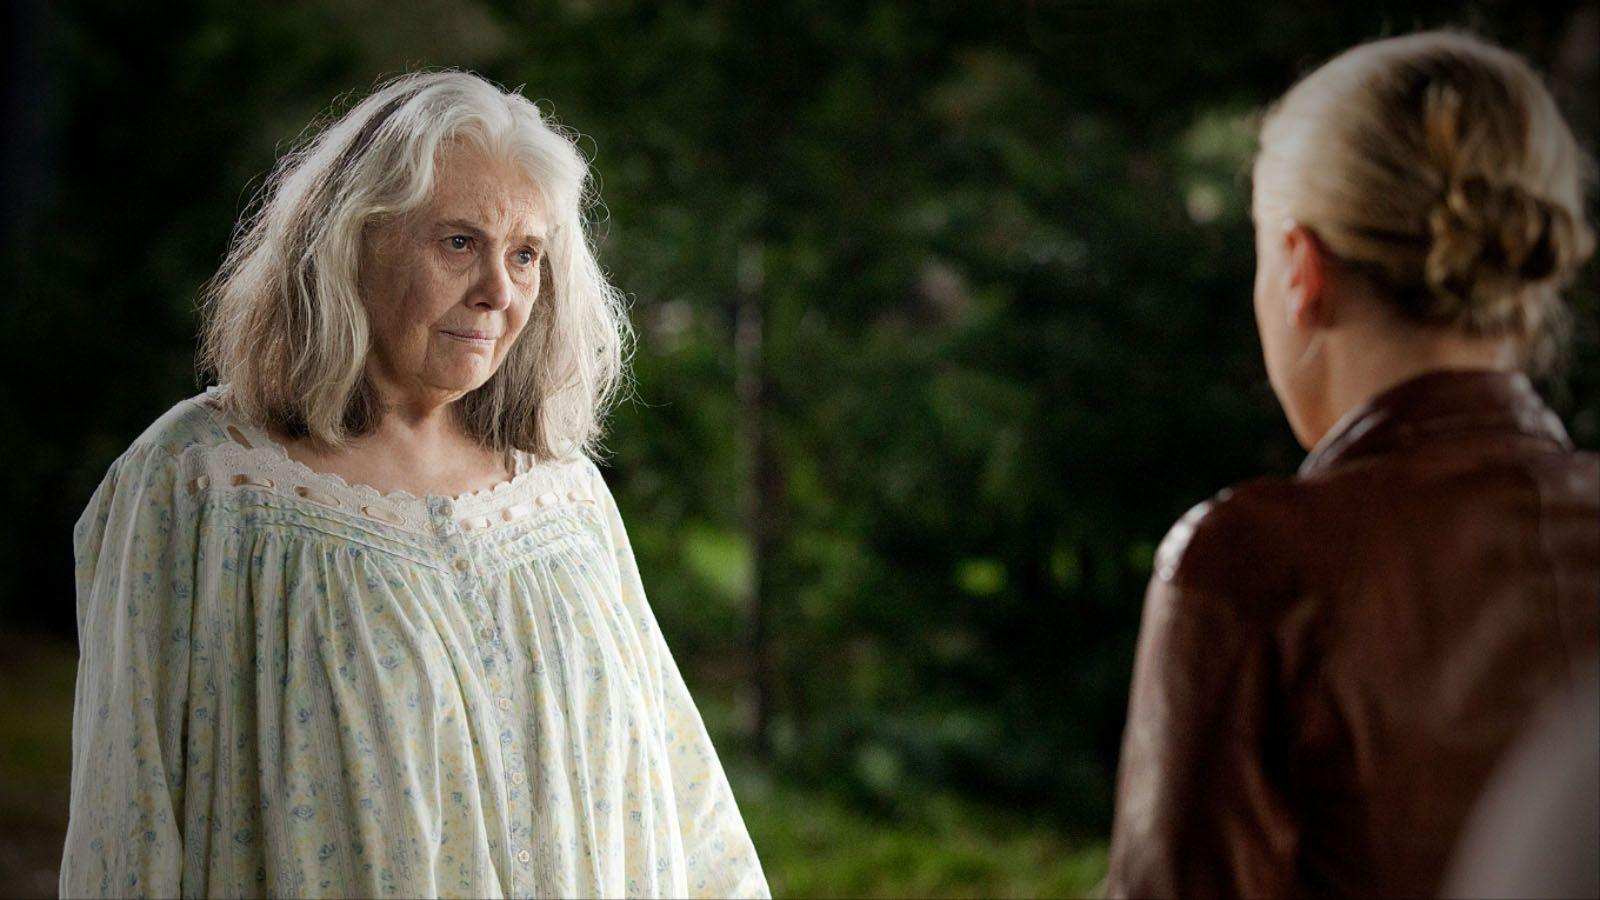 Wendy Davis (actress) advise